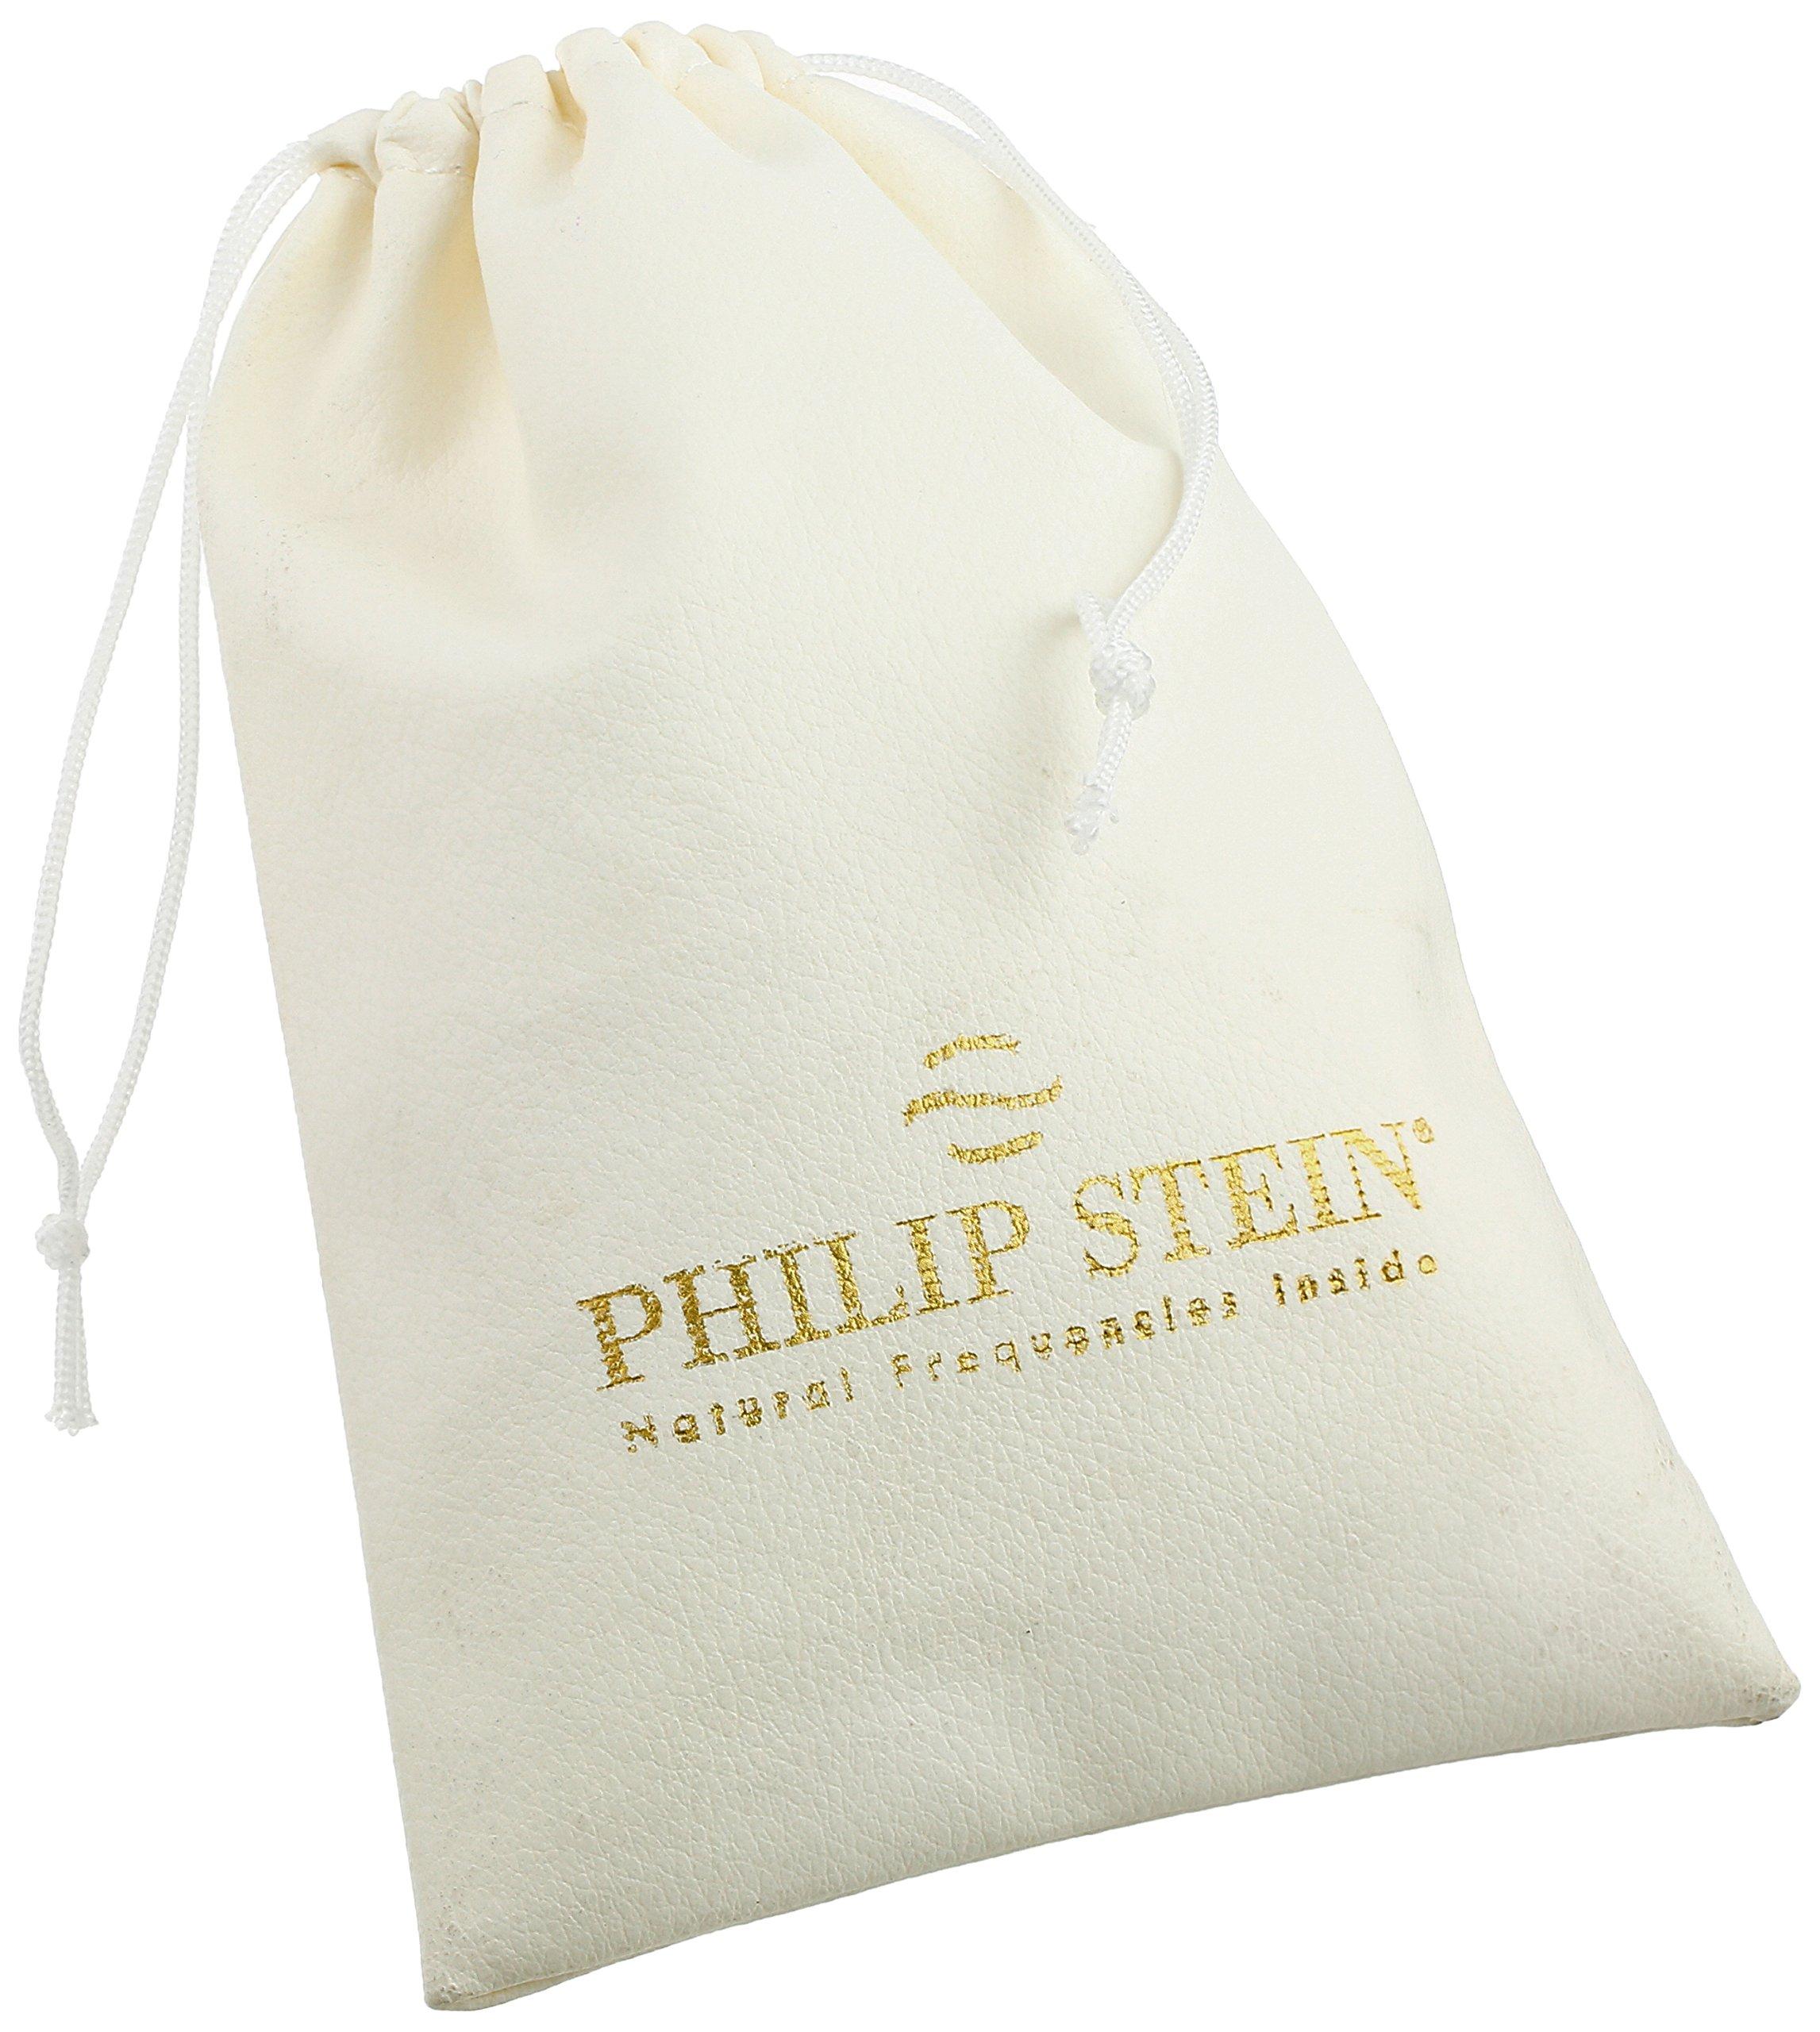 Philip Stein 1-SS3 18mm Stainless Steel Silver Watch Bracelet by Philip Stein (Image #4)